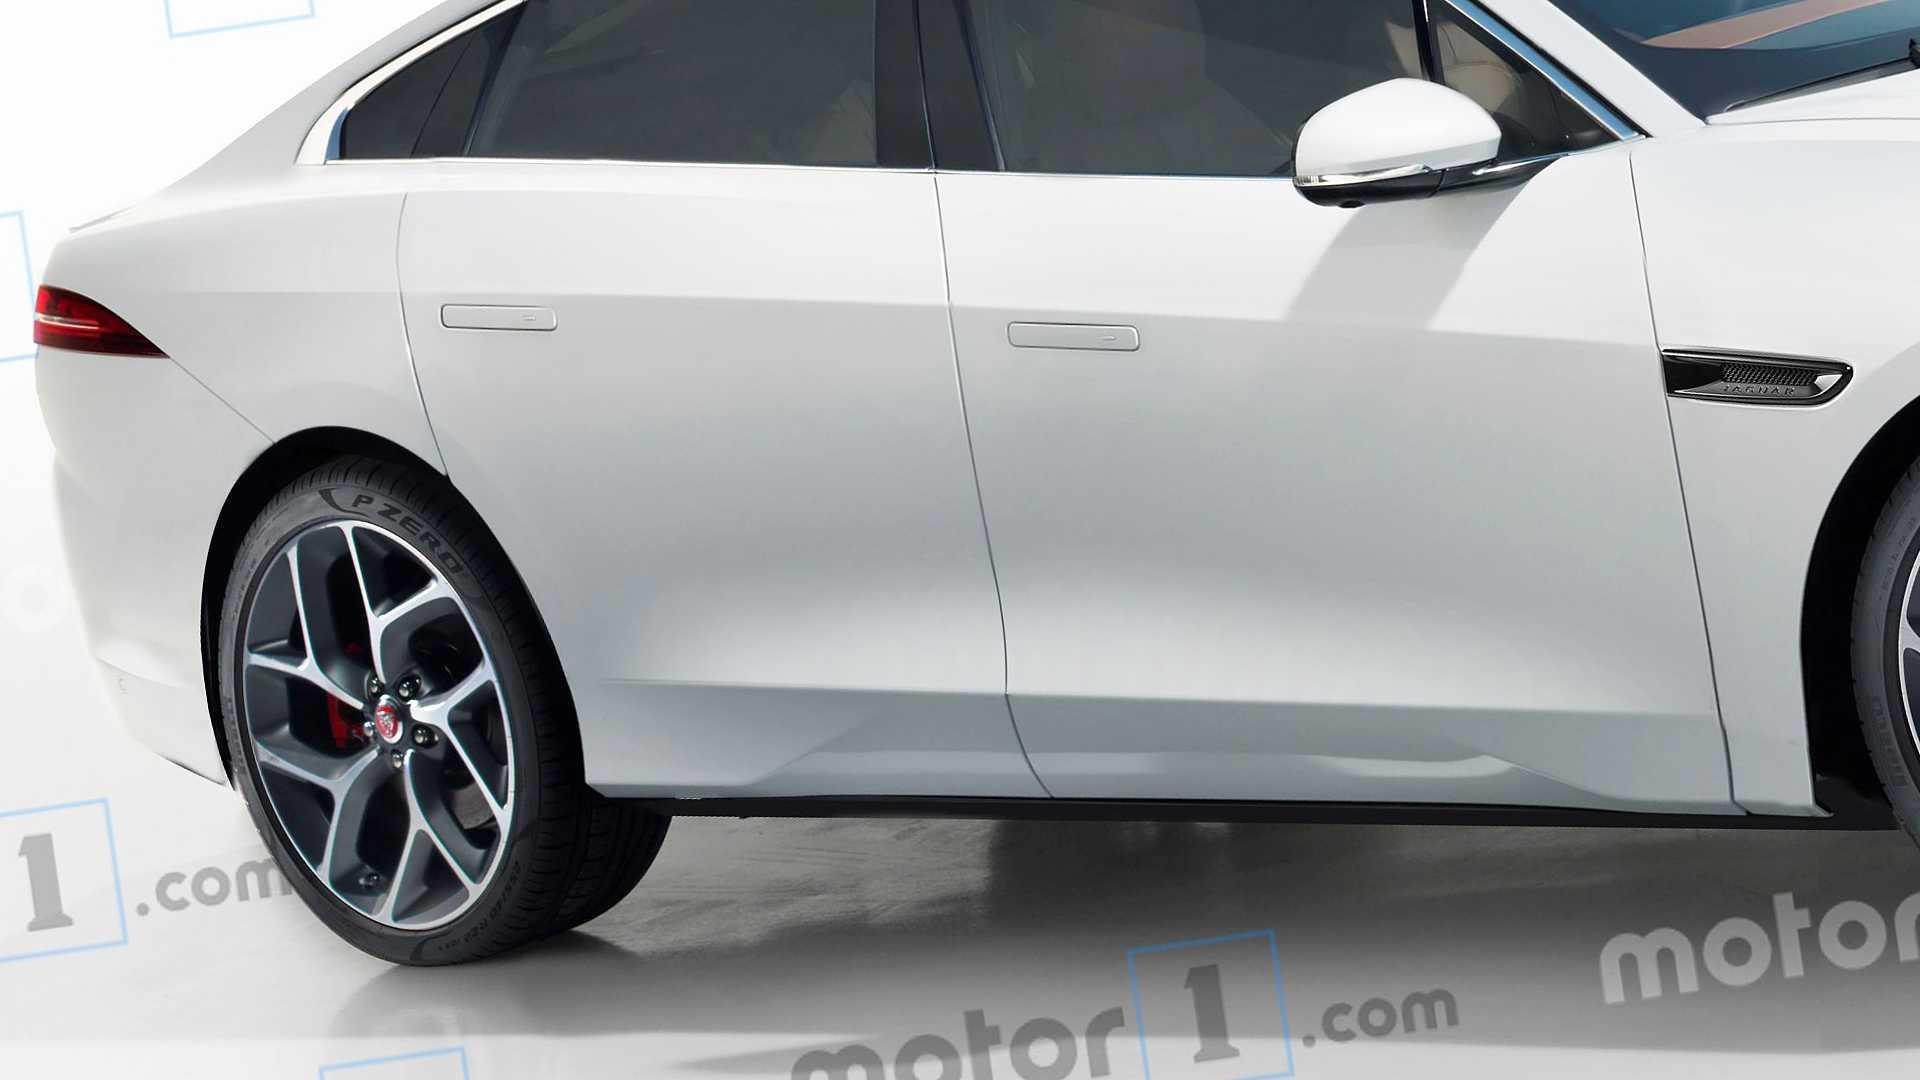 11 Concept of Jaguar Sedan 2020 New Concept with Jaguar Sedan 2020